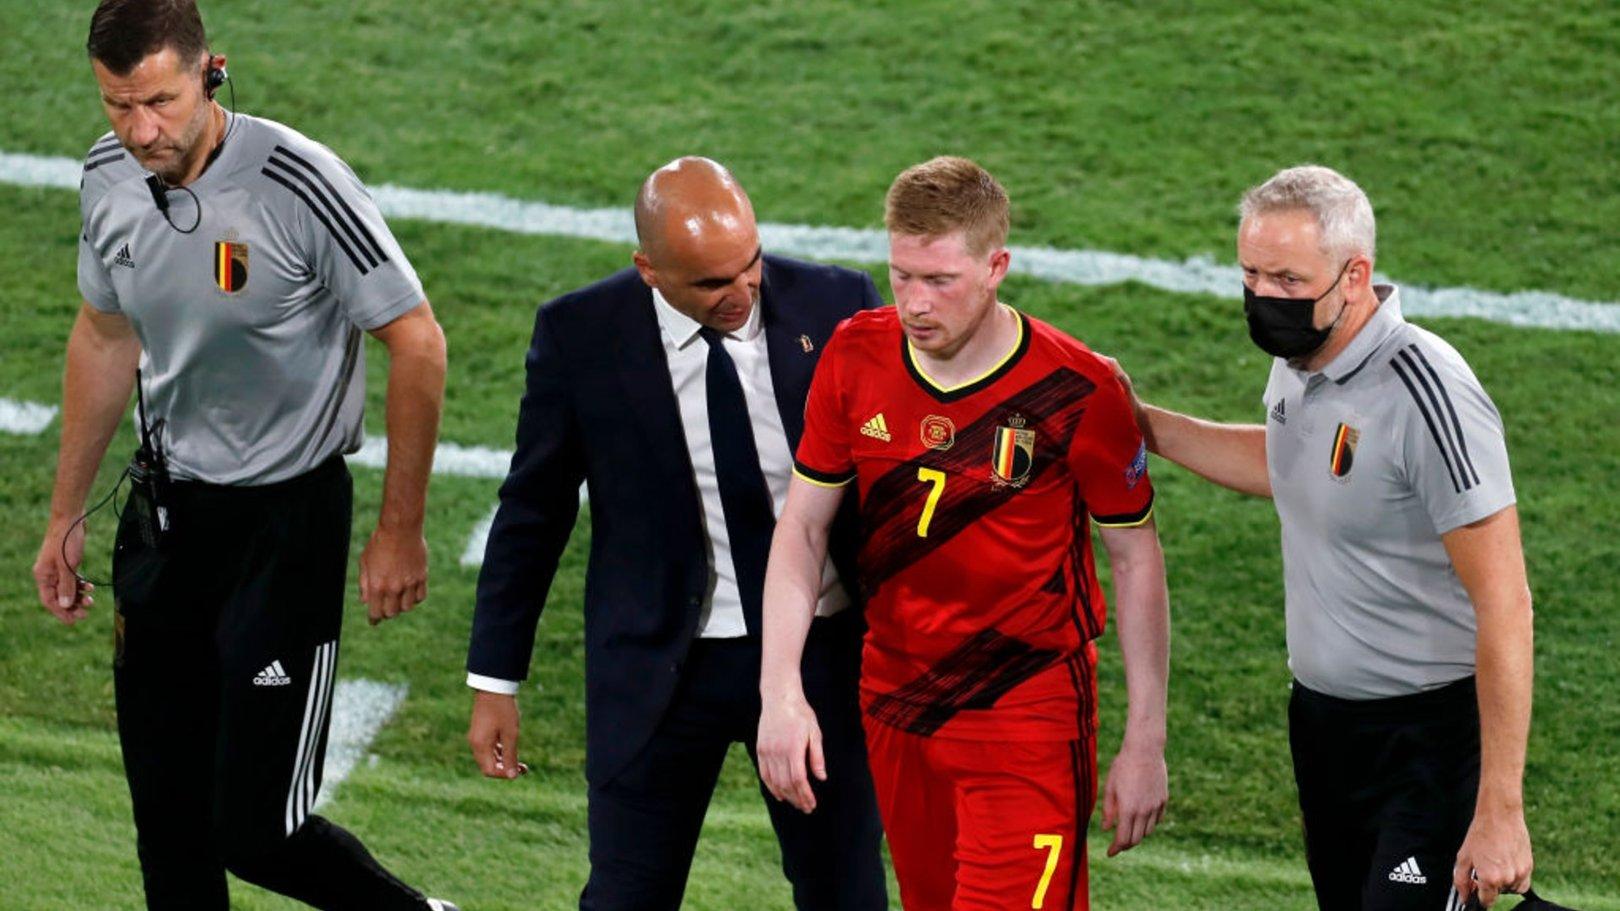 De Bruyne injury concern as Belgium edge past Portugal